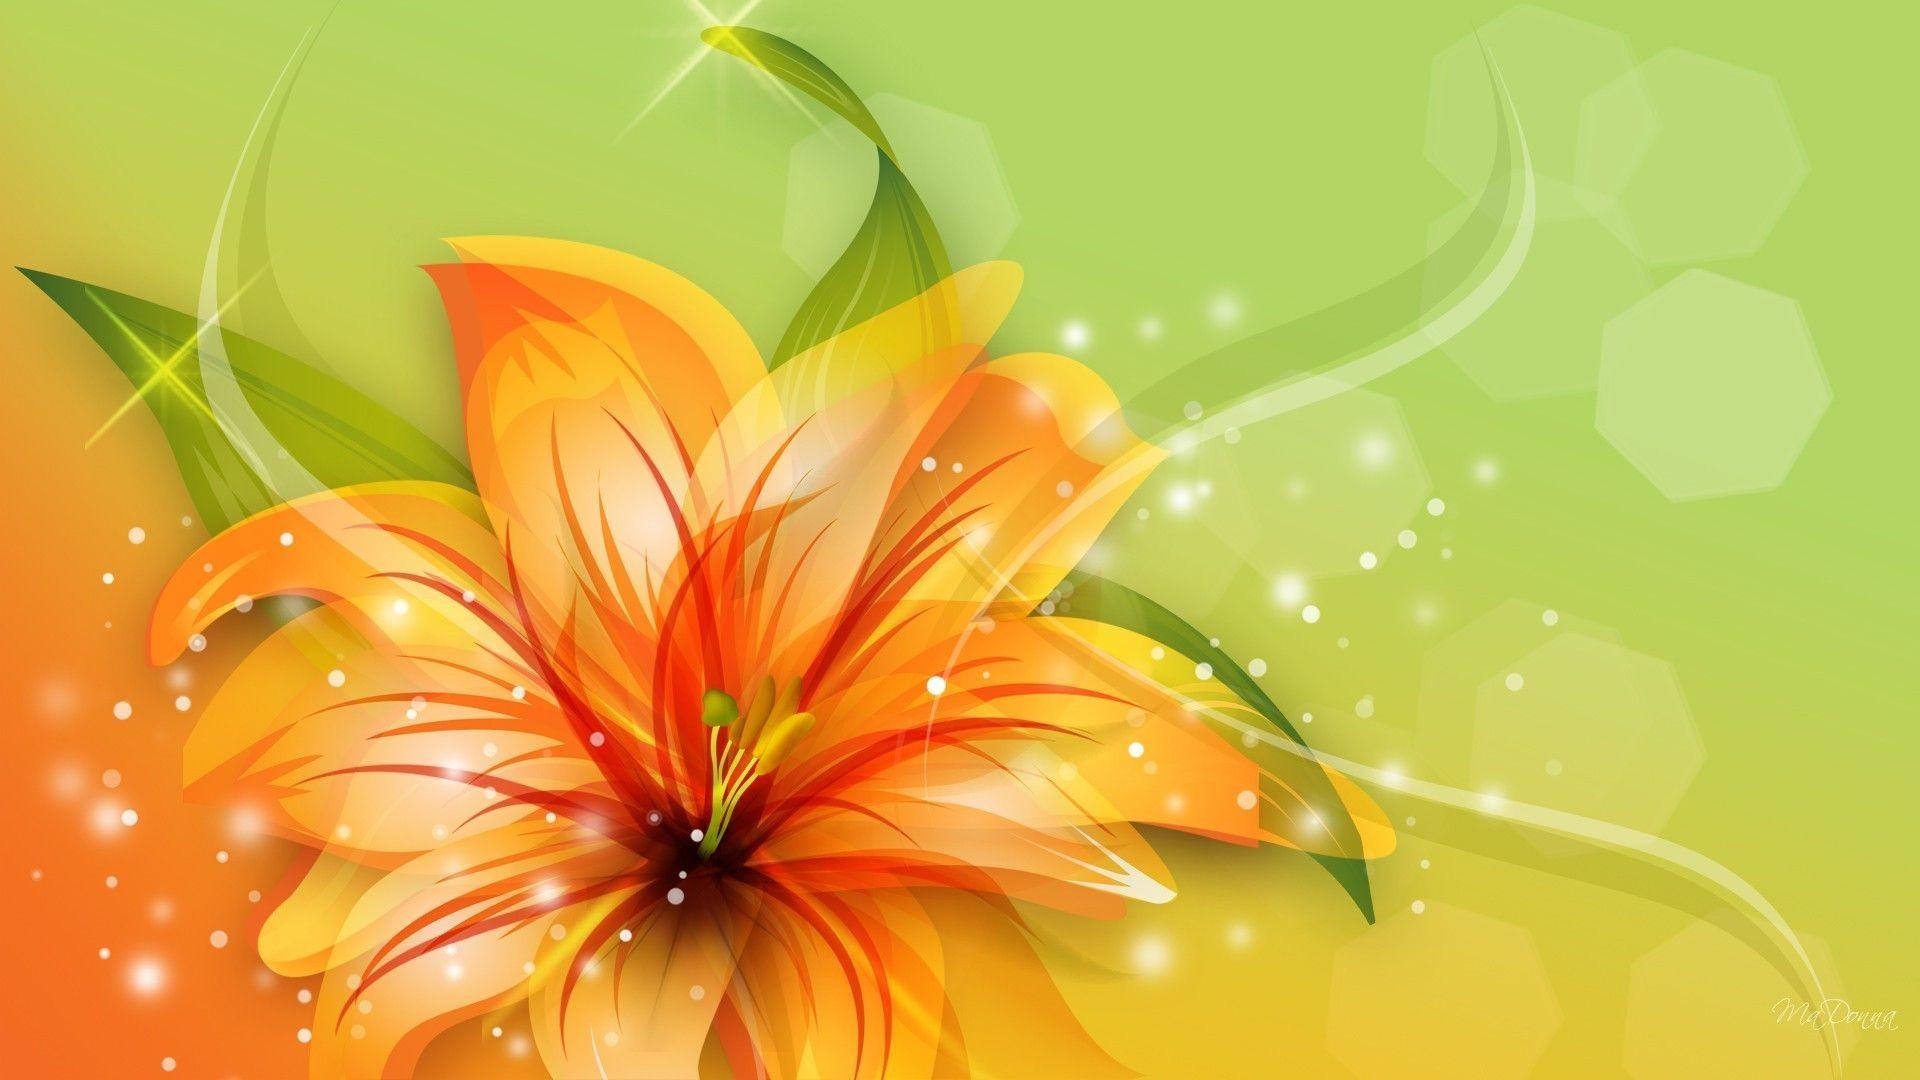 Tiger Lily Wallpaper